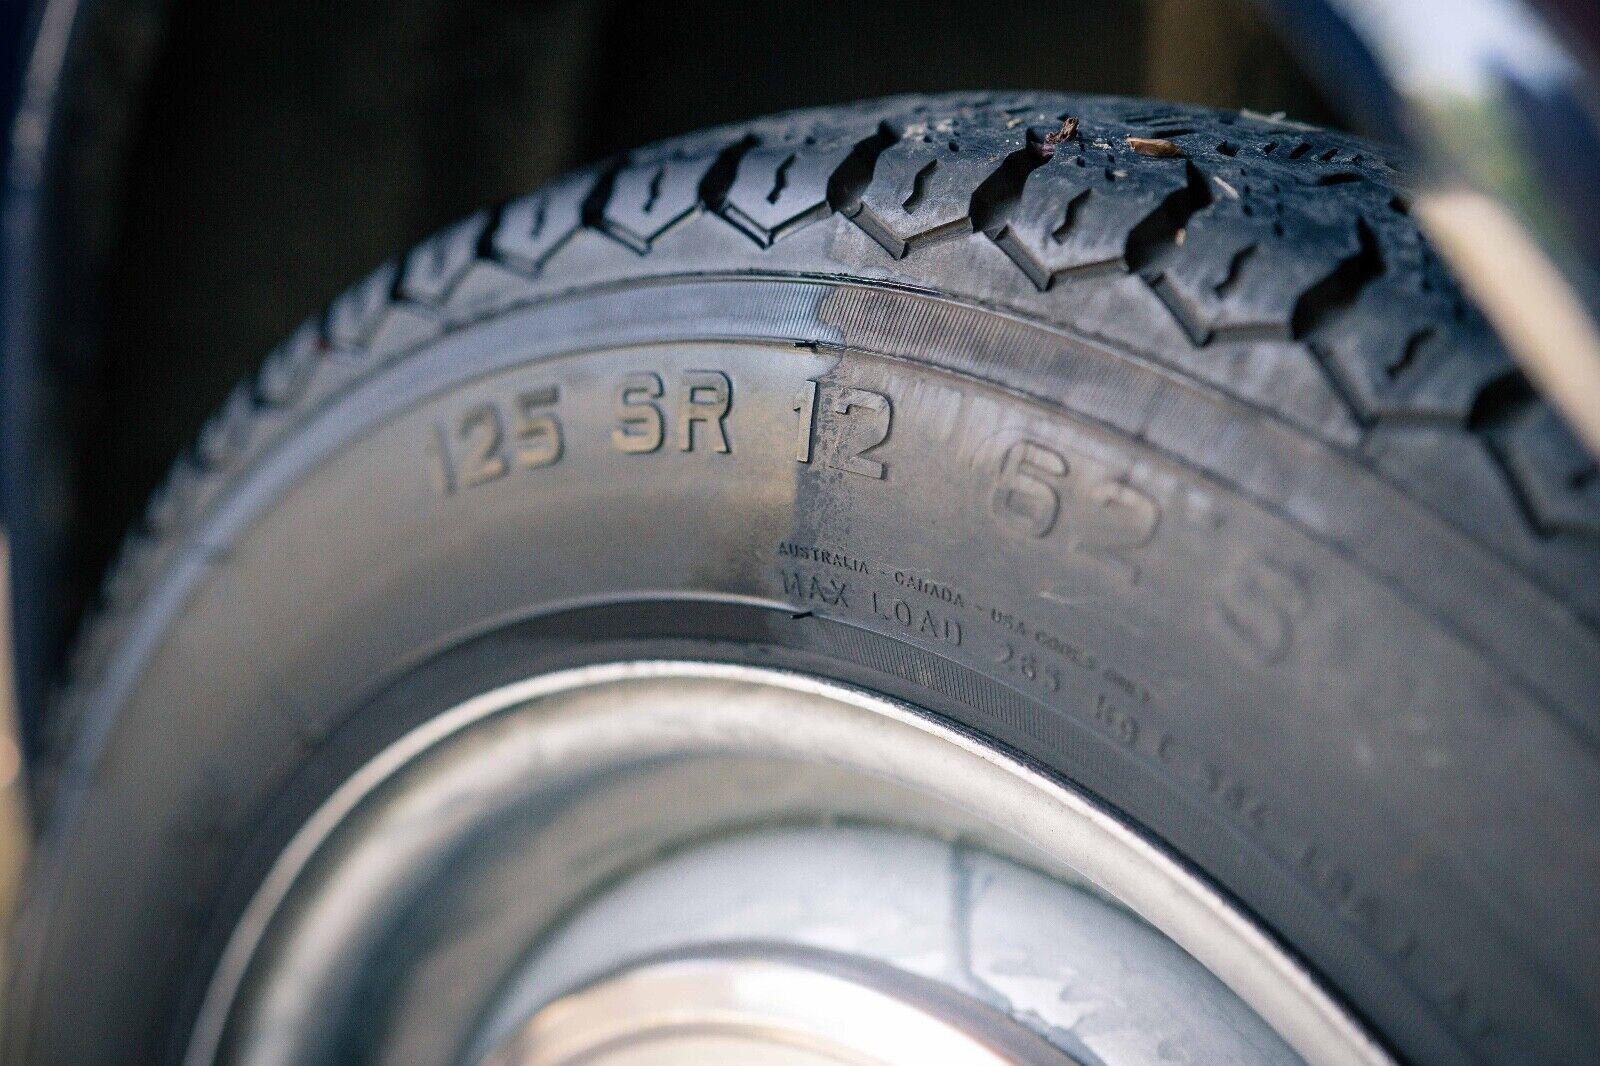 DETAILIFY Blacky Reifenglanz, Applikator, Gummi-, Reifenschutz Reifenpflege